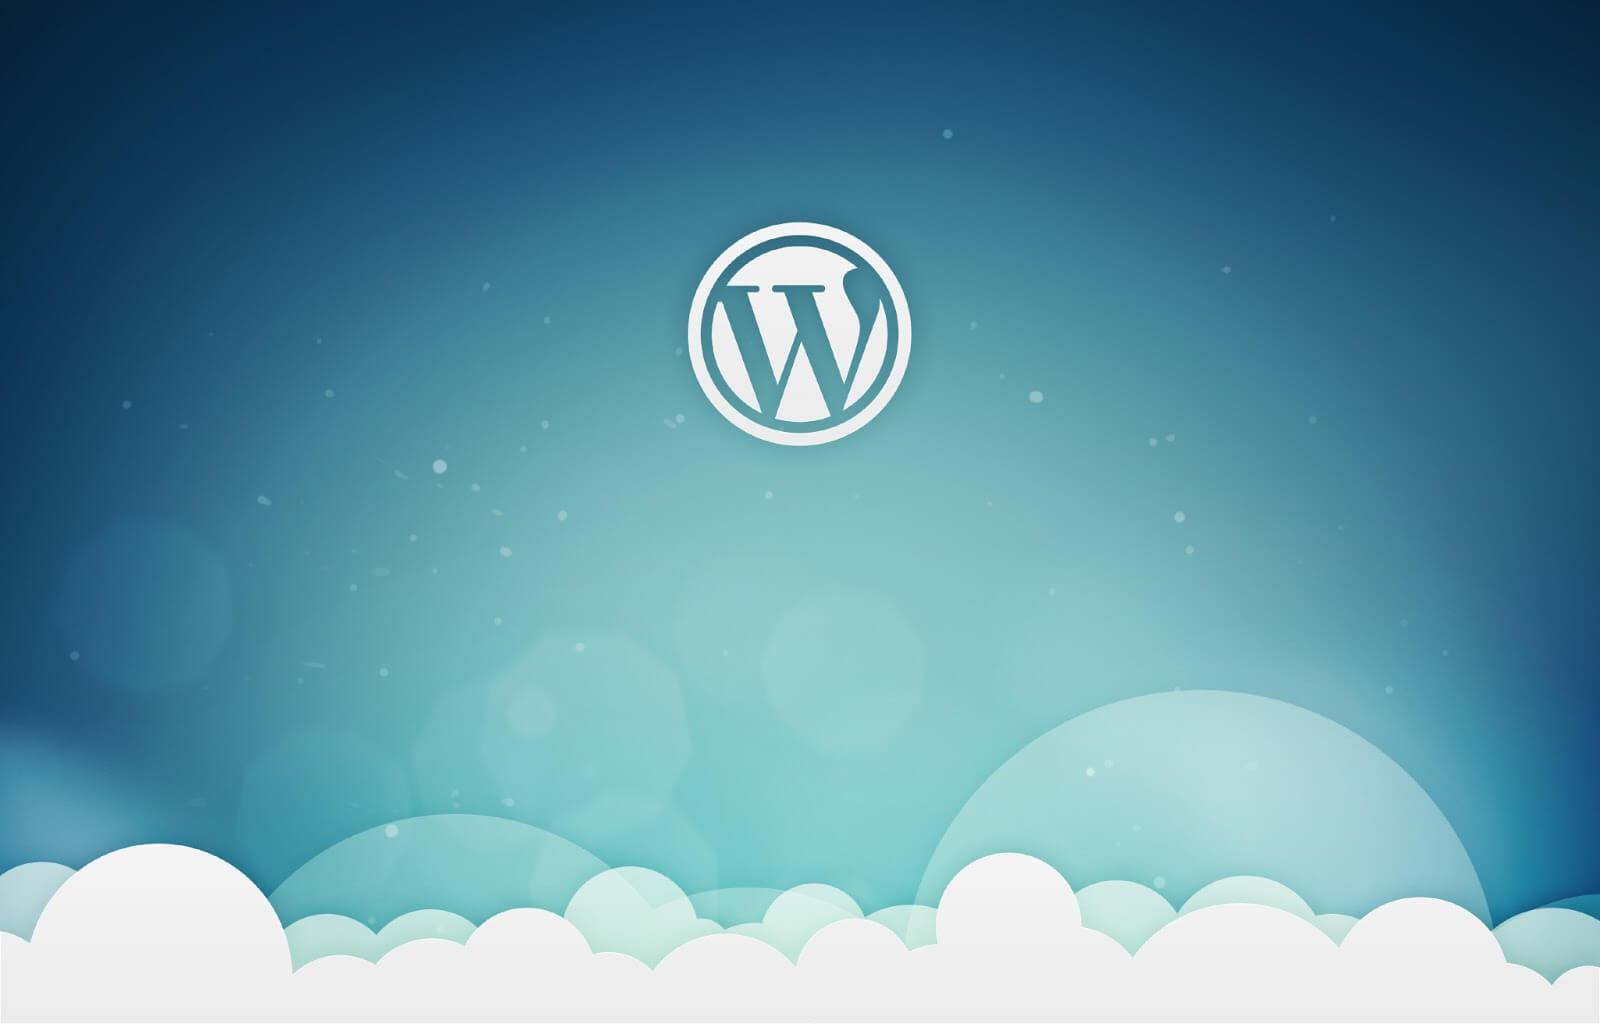 Wordpress Wallpaper 4 - WordPress WallPapers